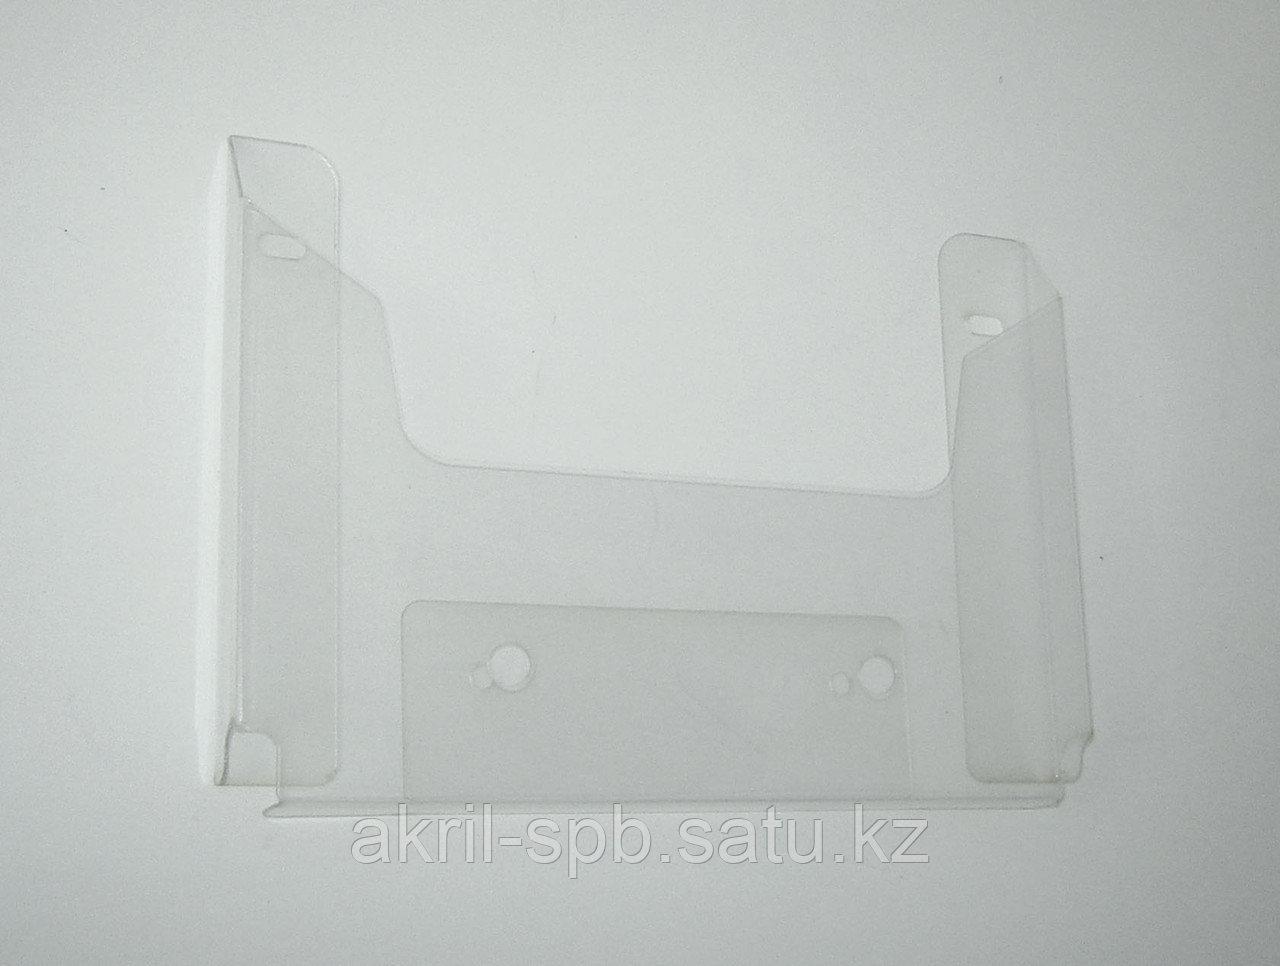 Карман буклетница настенная А5 горизонтальный 15 мм 0,7 ПЭТ